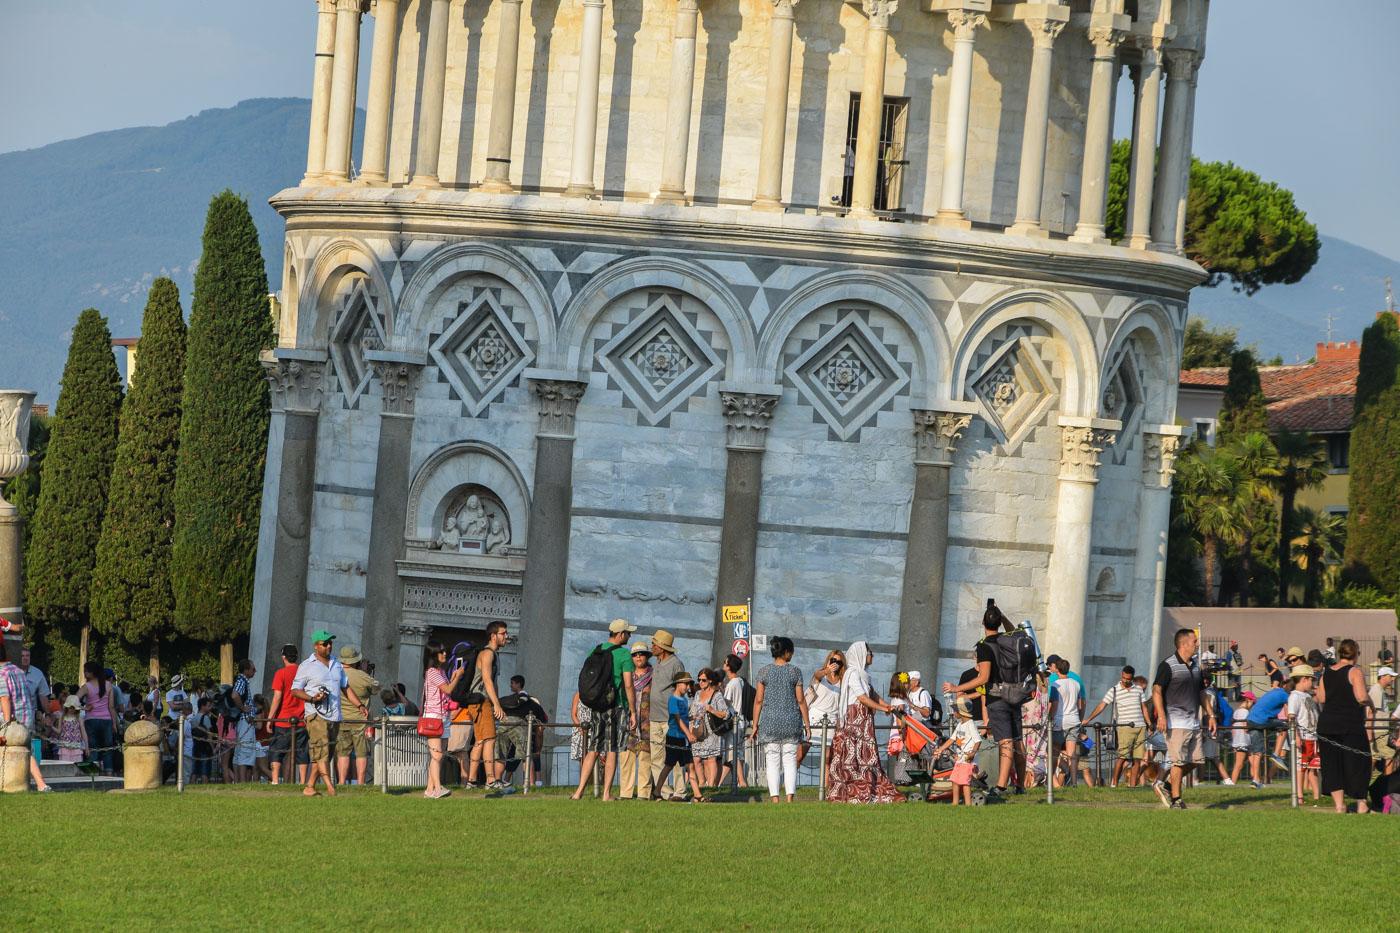 Путешествие на велосипеде по Италии - Пиза, Маса, Ливорно